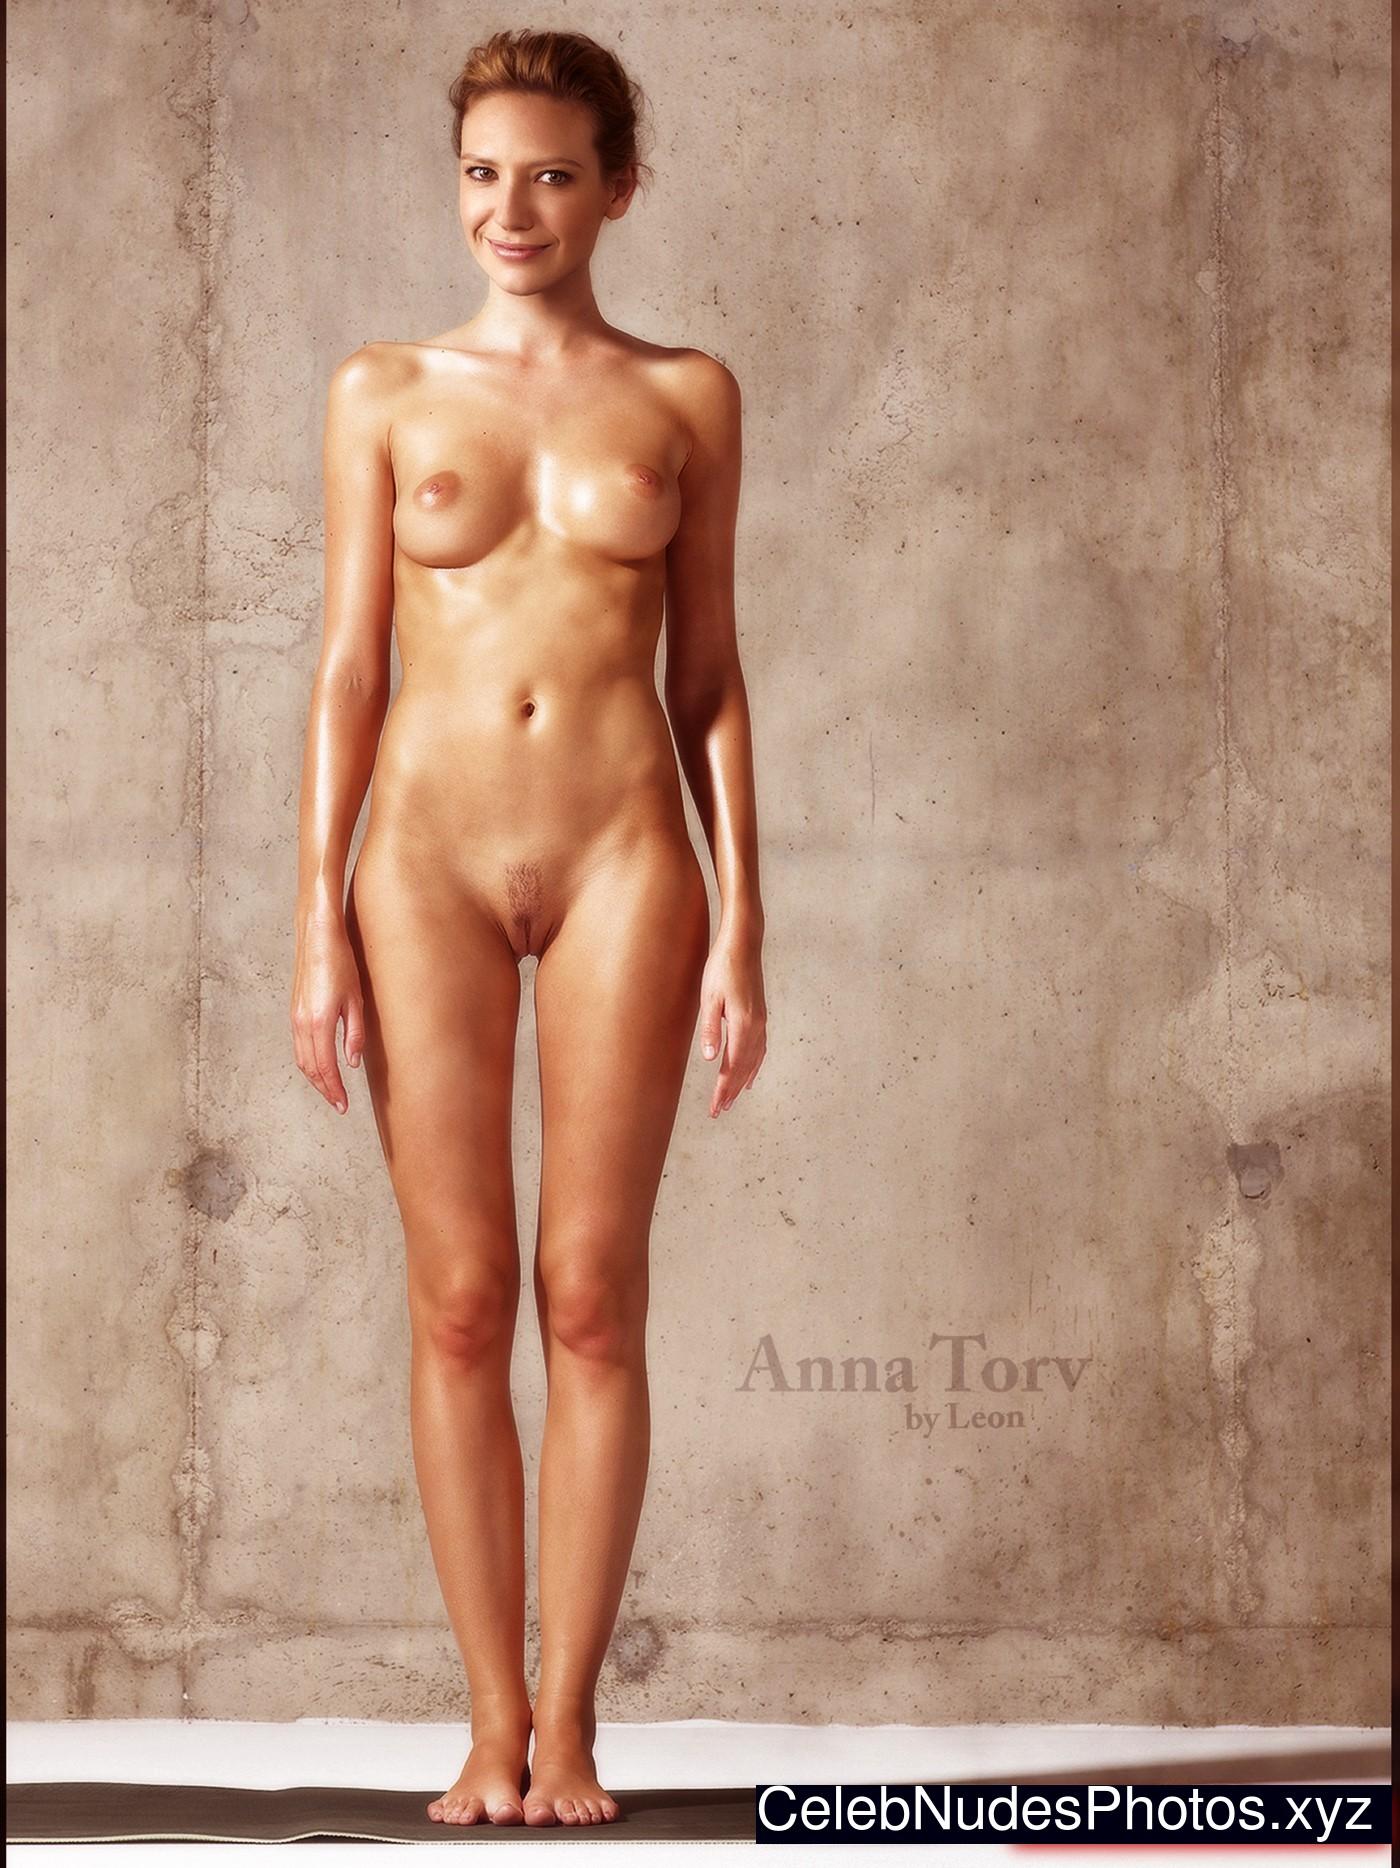 anna torv nude movie